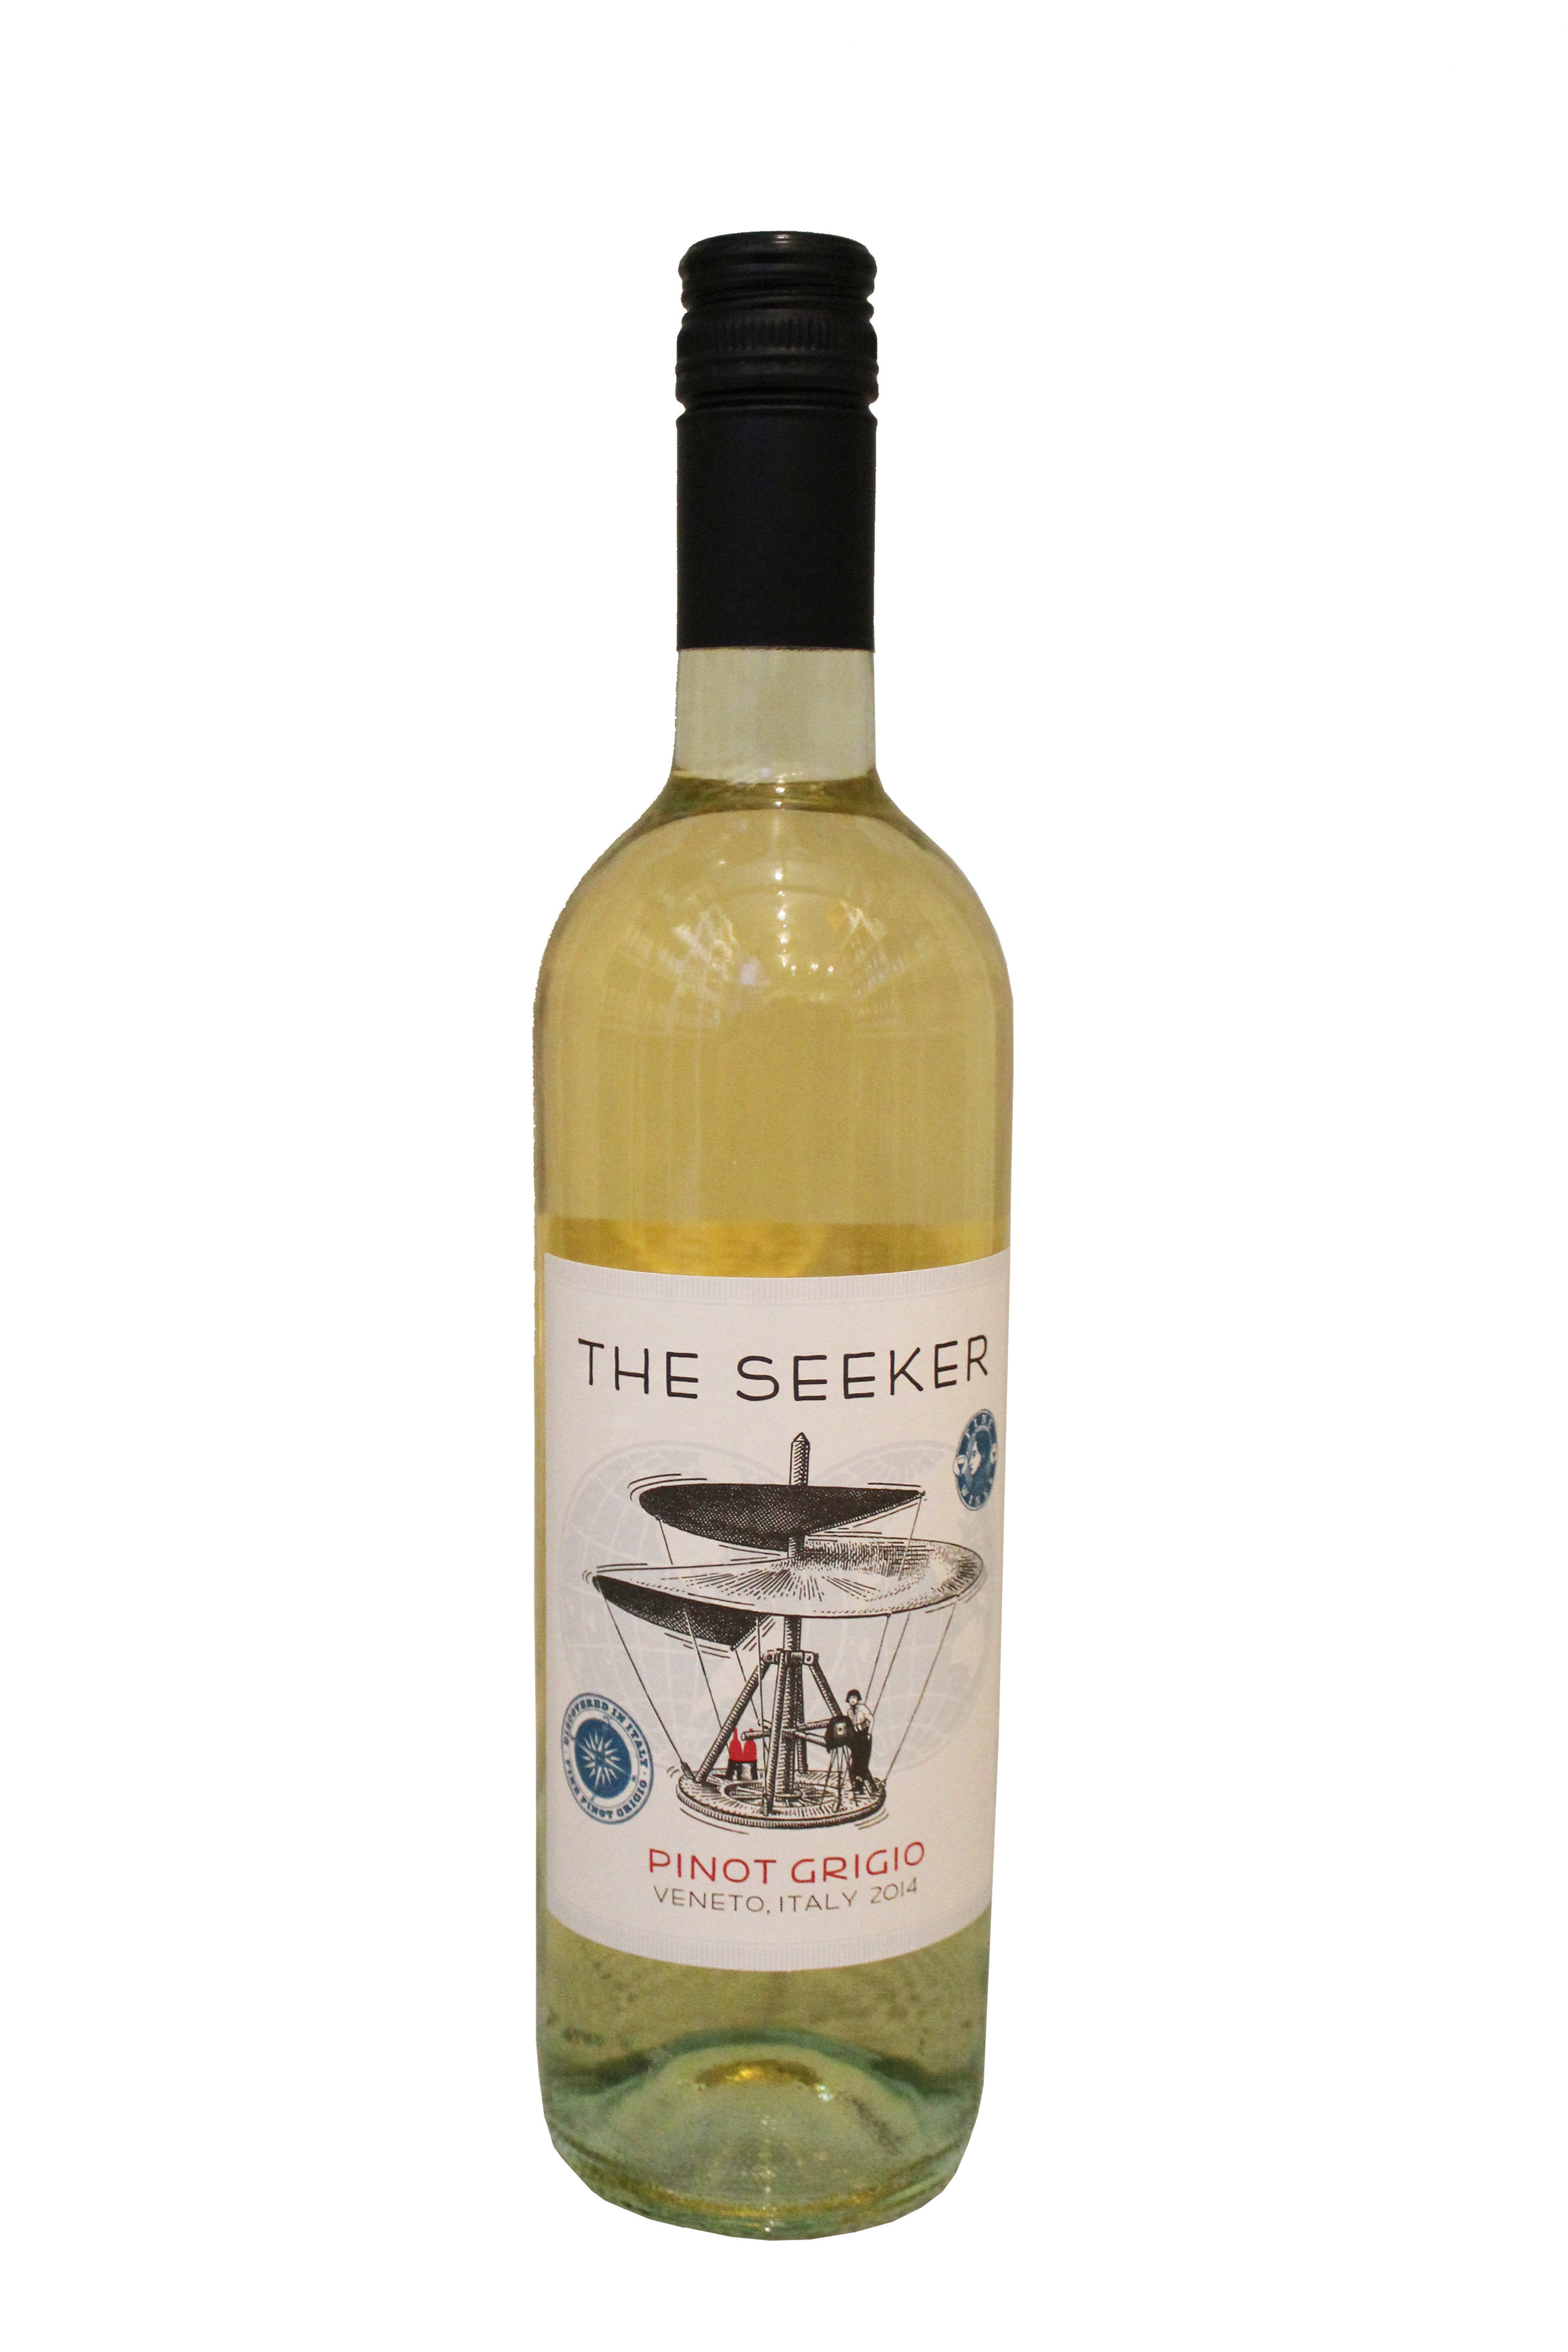 Pinot Grigio  The Seeker, California